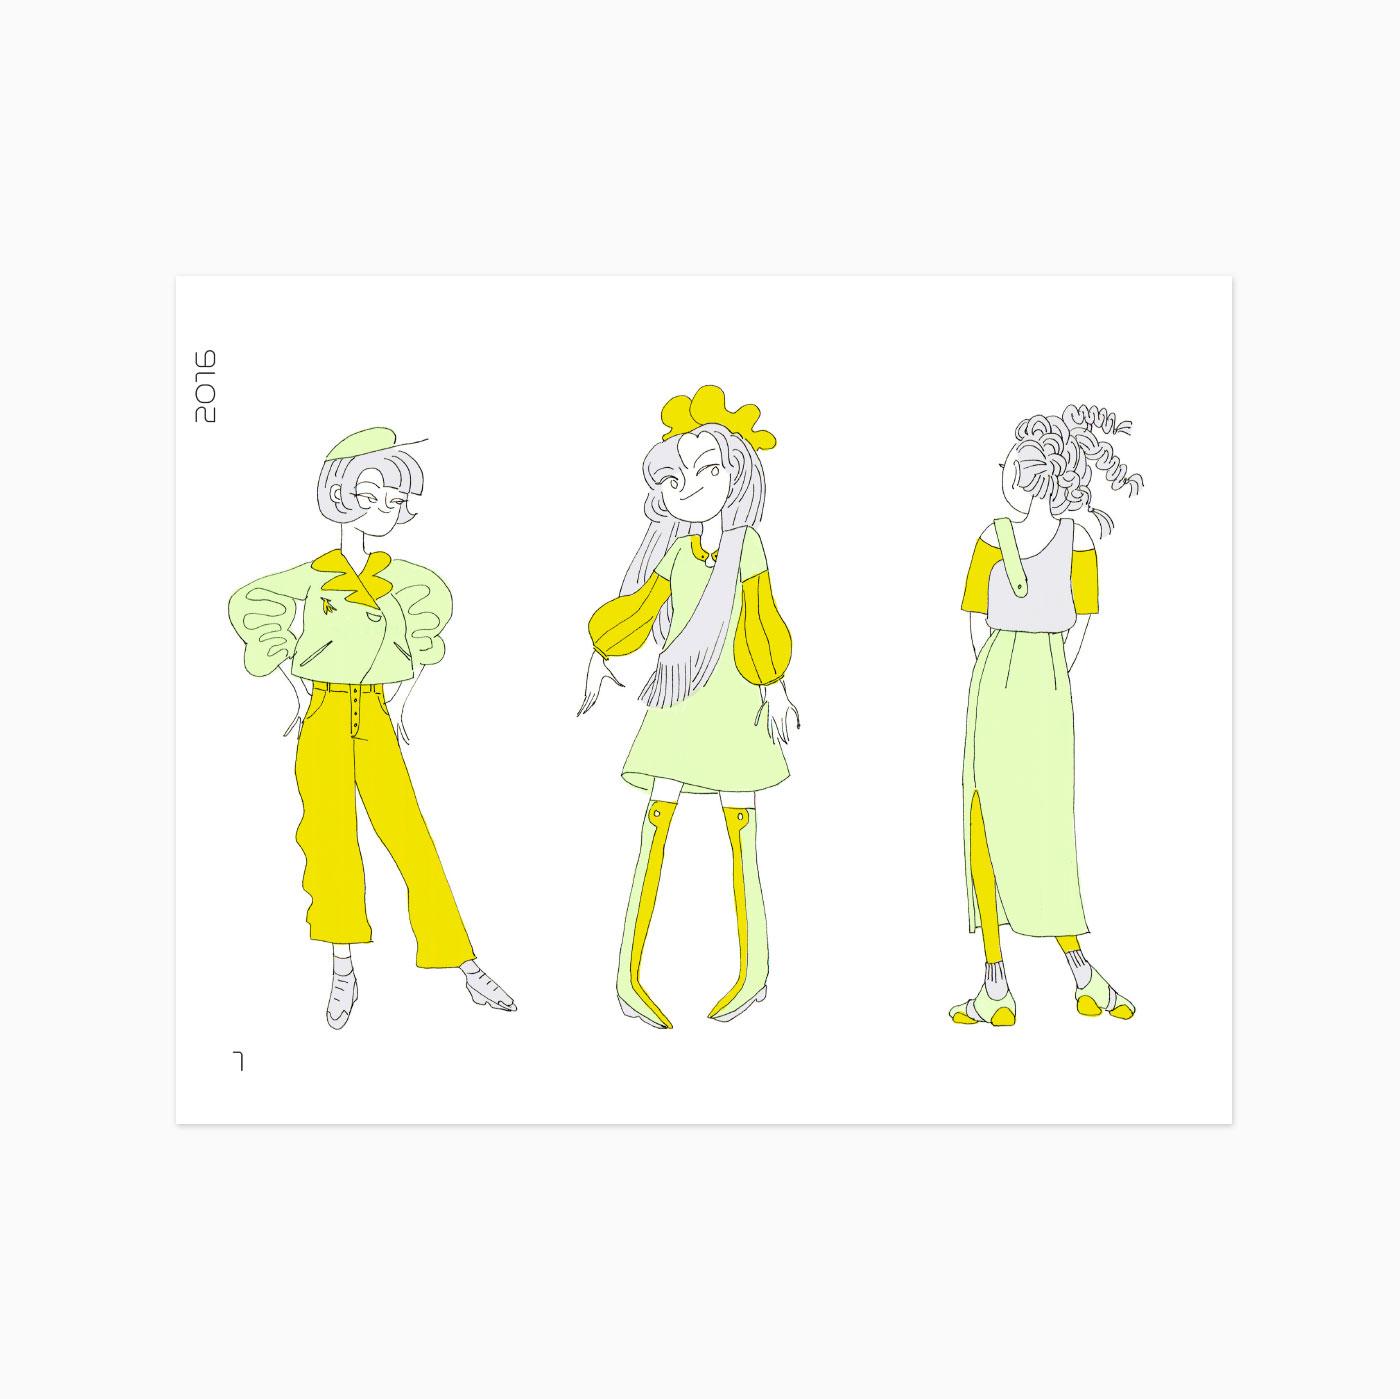 GN_CO_IL_Flower_website-p01_1400x1400.jpg